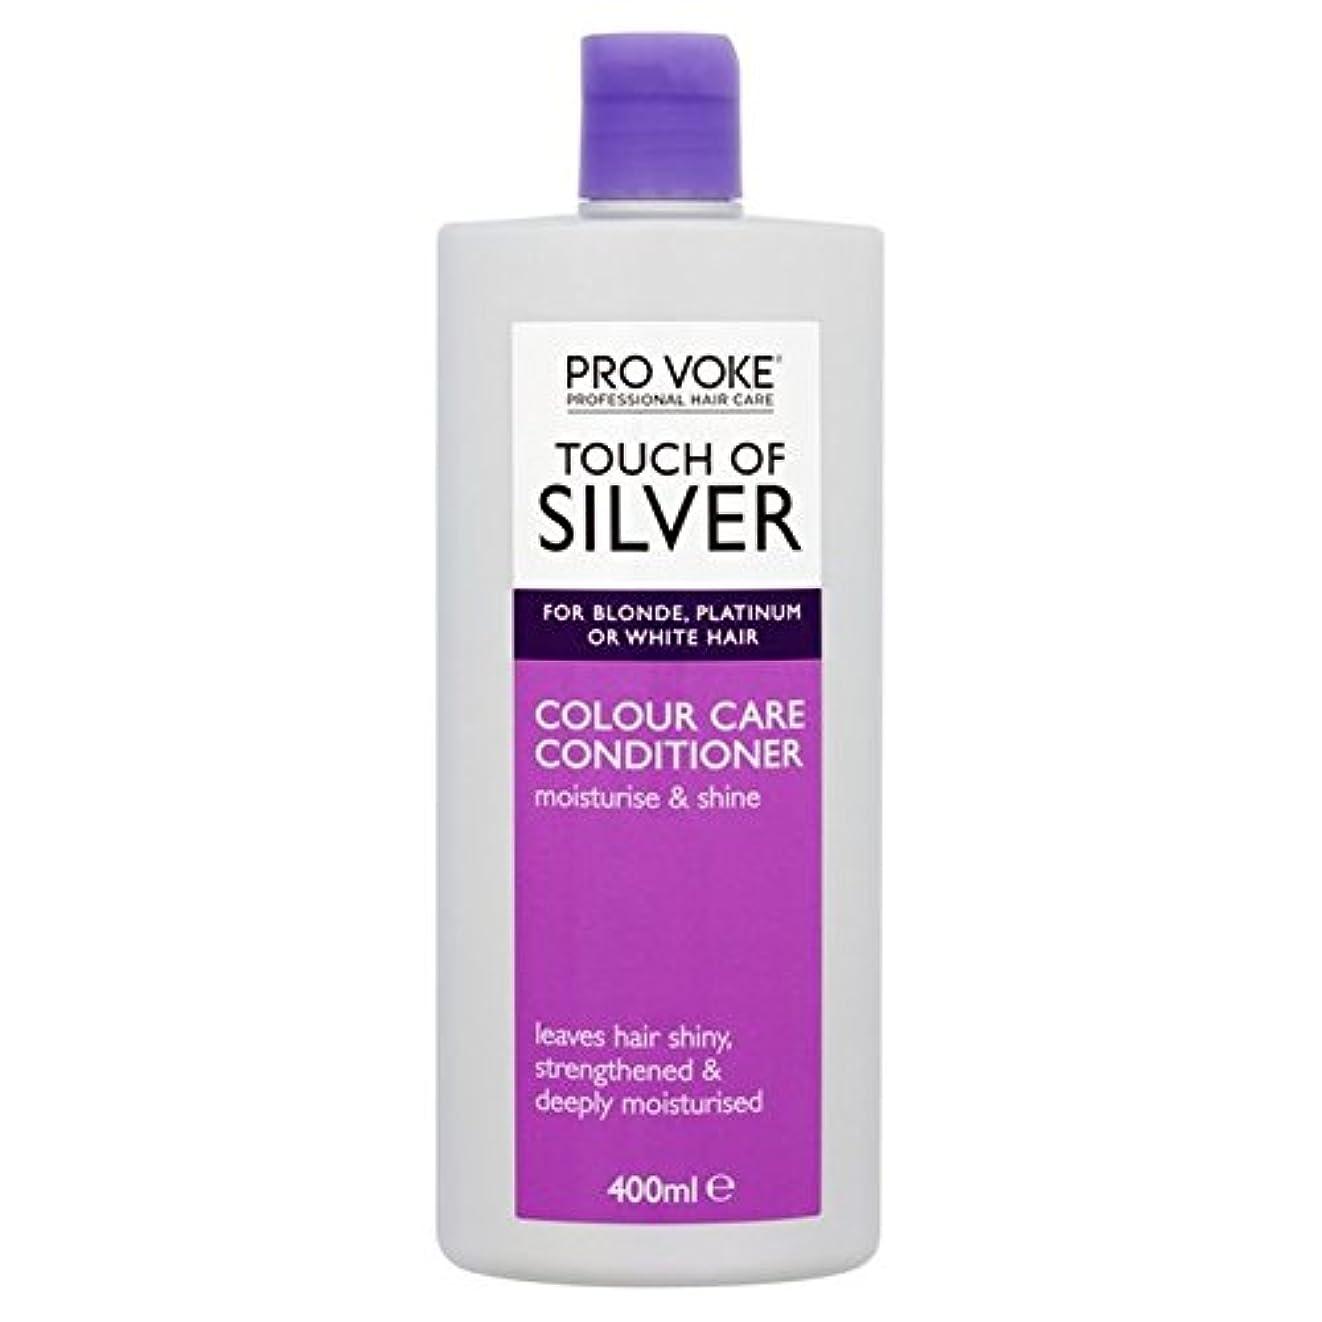 Touch of Silver Daily Nourish Conditioner 400ml - 銀毎日ナリッシュコンディショナー400ミリリットルのタッチ [並行輸入品]